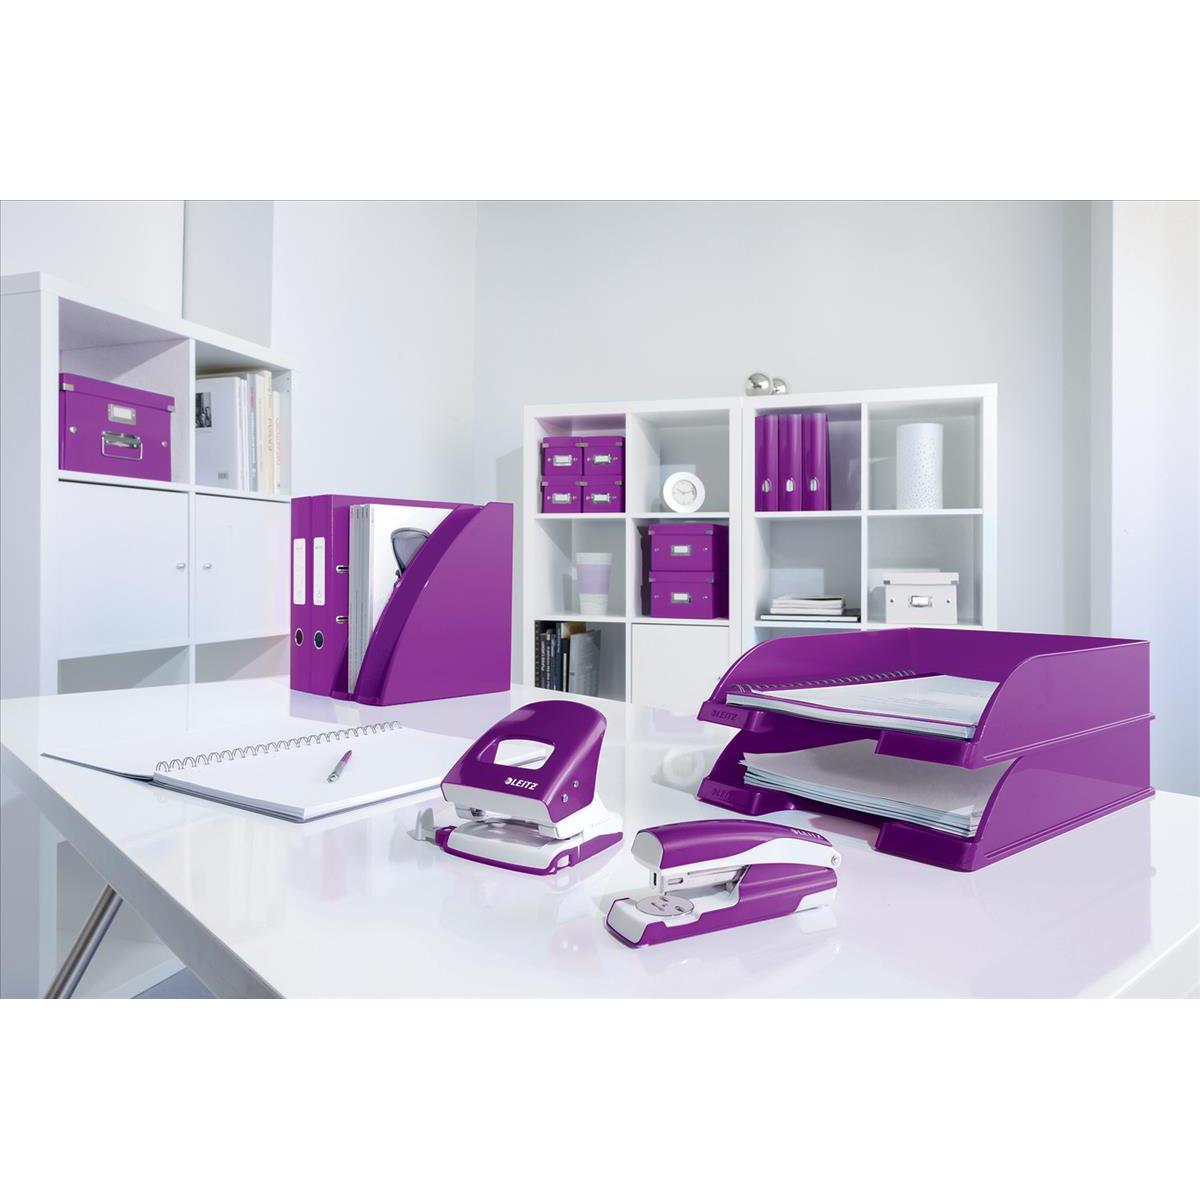 Leitz NeXXt WOW Stapler 3mm 30 Sheet Purple Ref 55021062 REDEMPTION Oct-Dec19